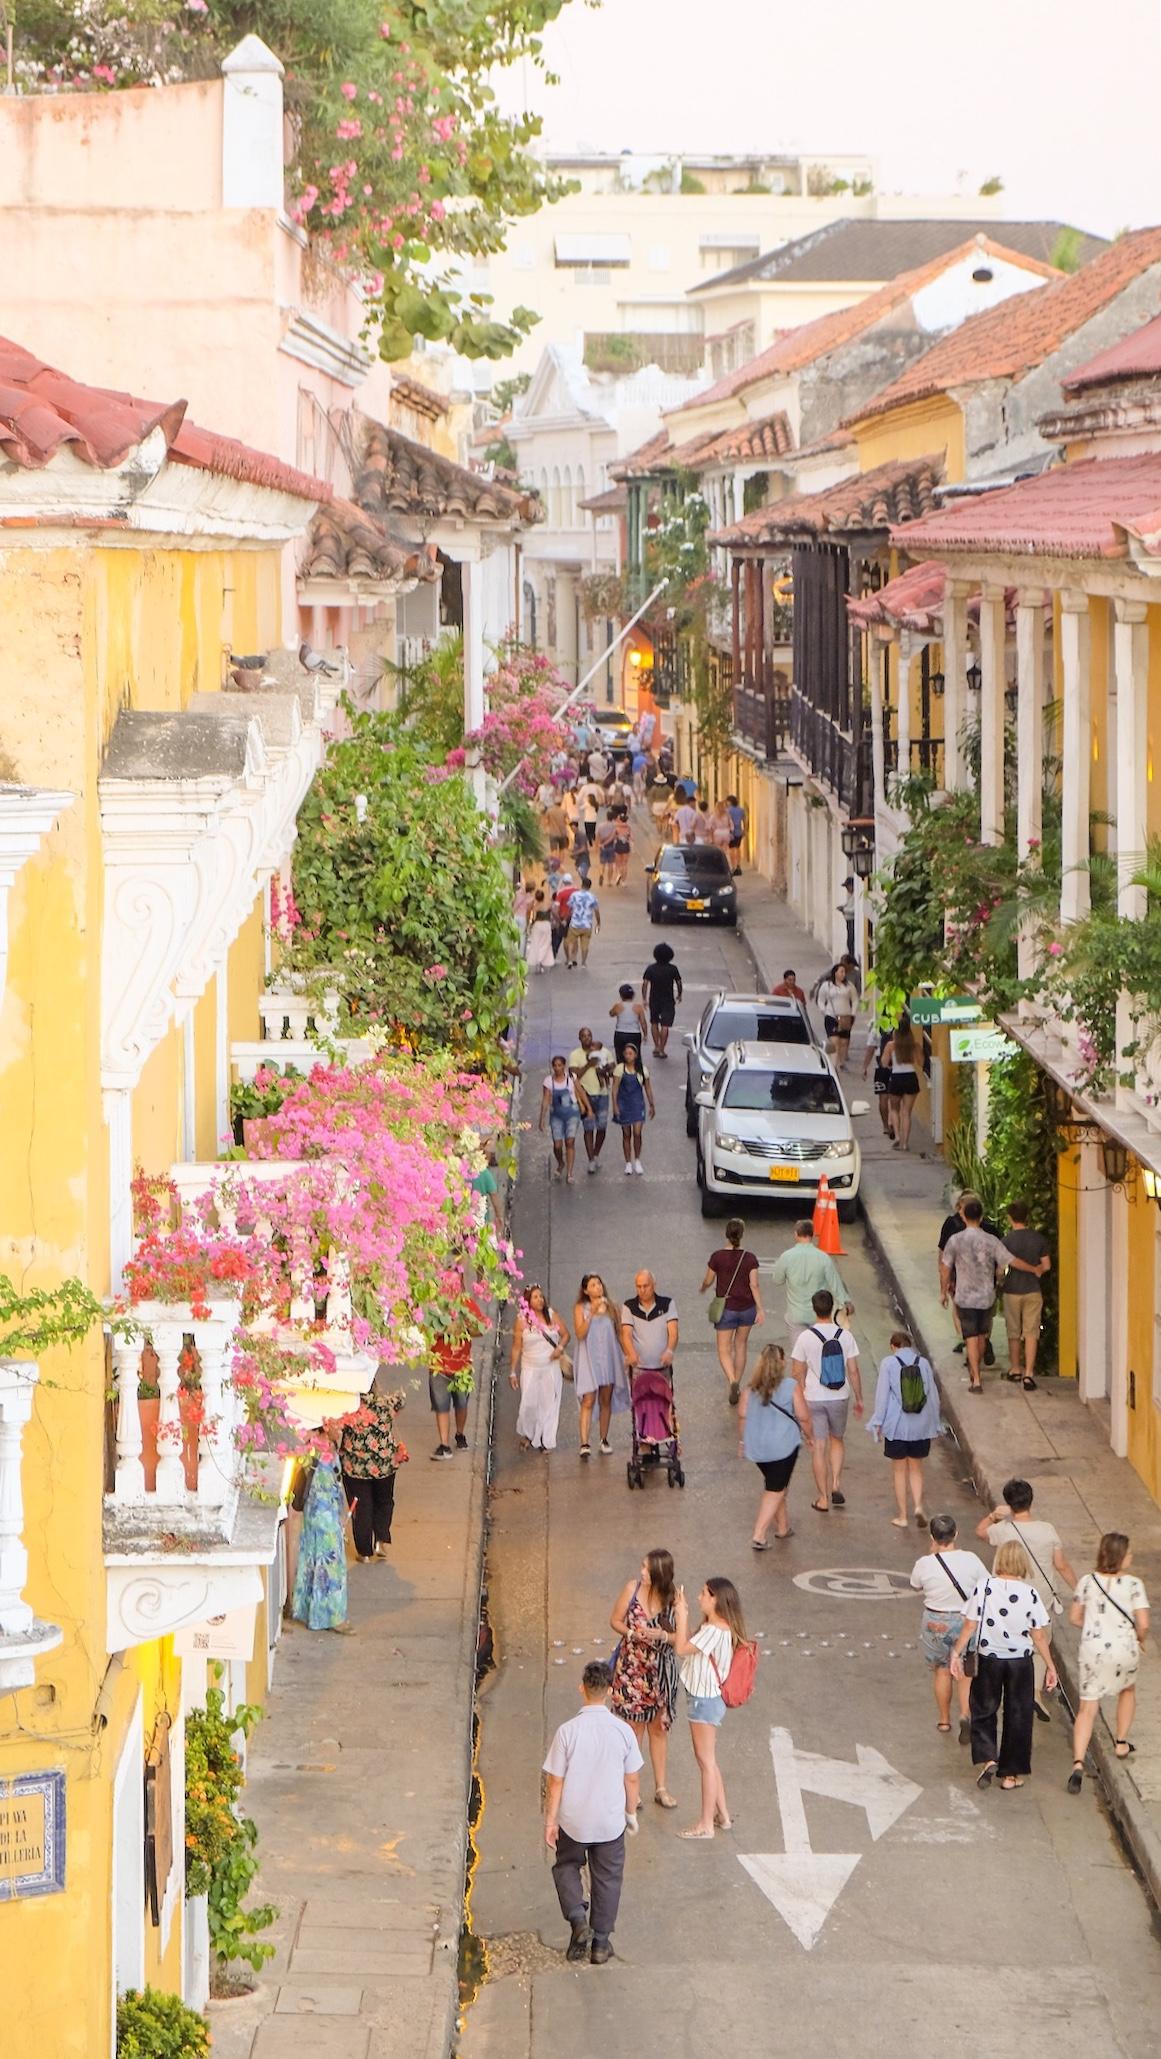 Cosa fare a Cartagena - Consiglidigusto